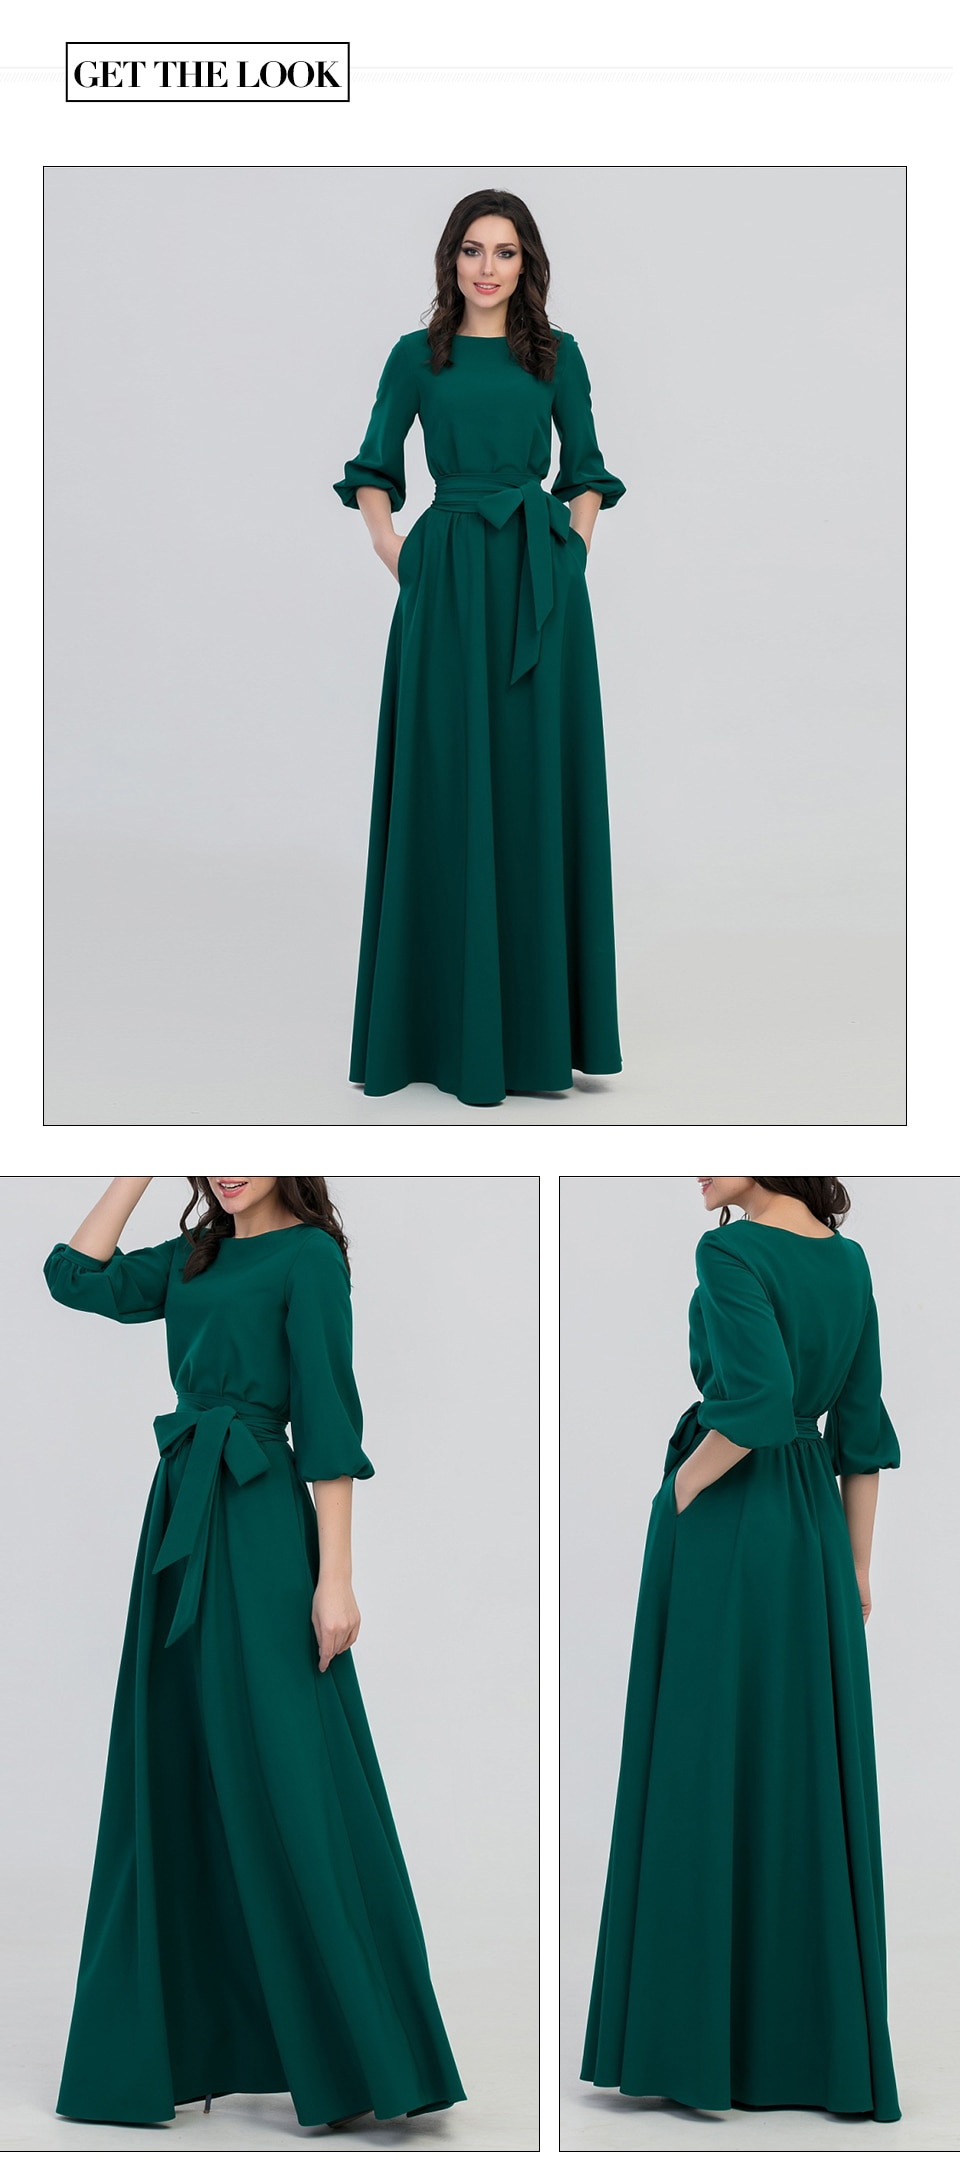 S.FLAVOR Autumn Winter woman O-Neck long dress bohemian style slim vestidos vintage three quarter lantern sleeve casual dress